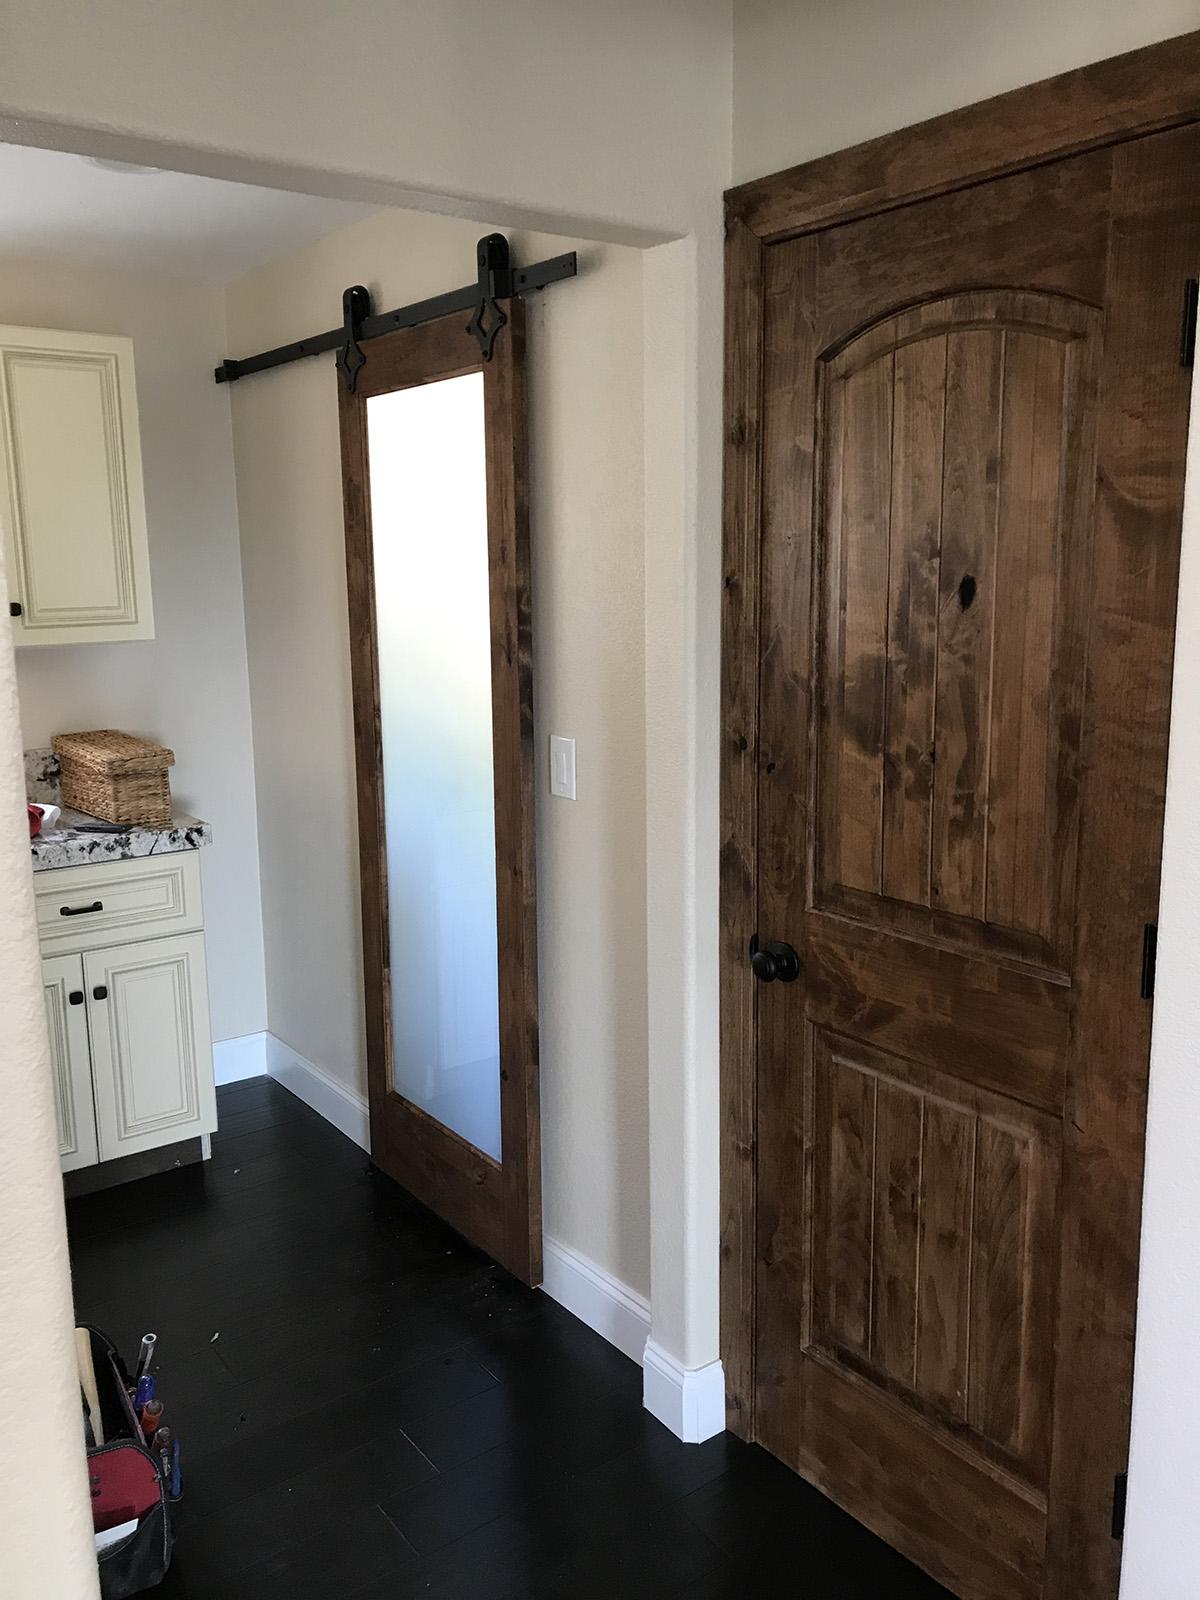 Barn San Jose CA Replacement Window And Doors